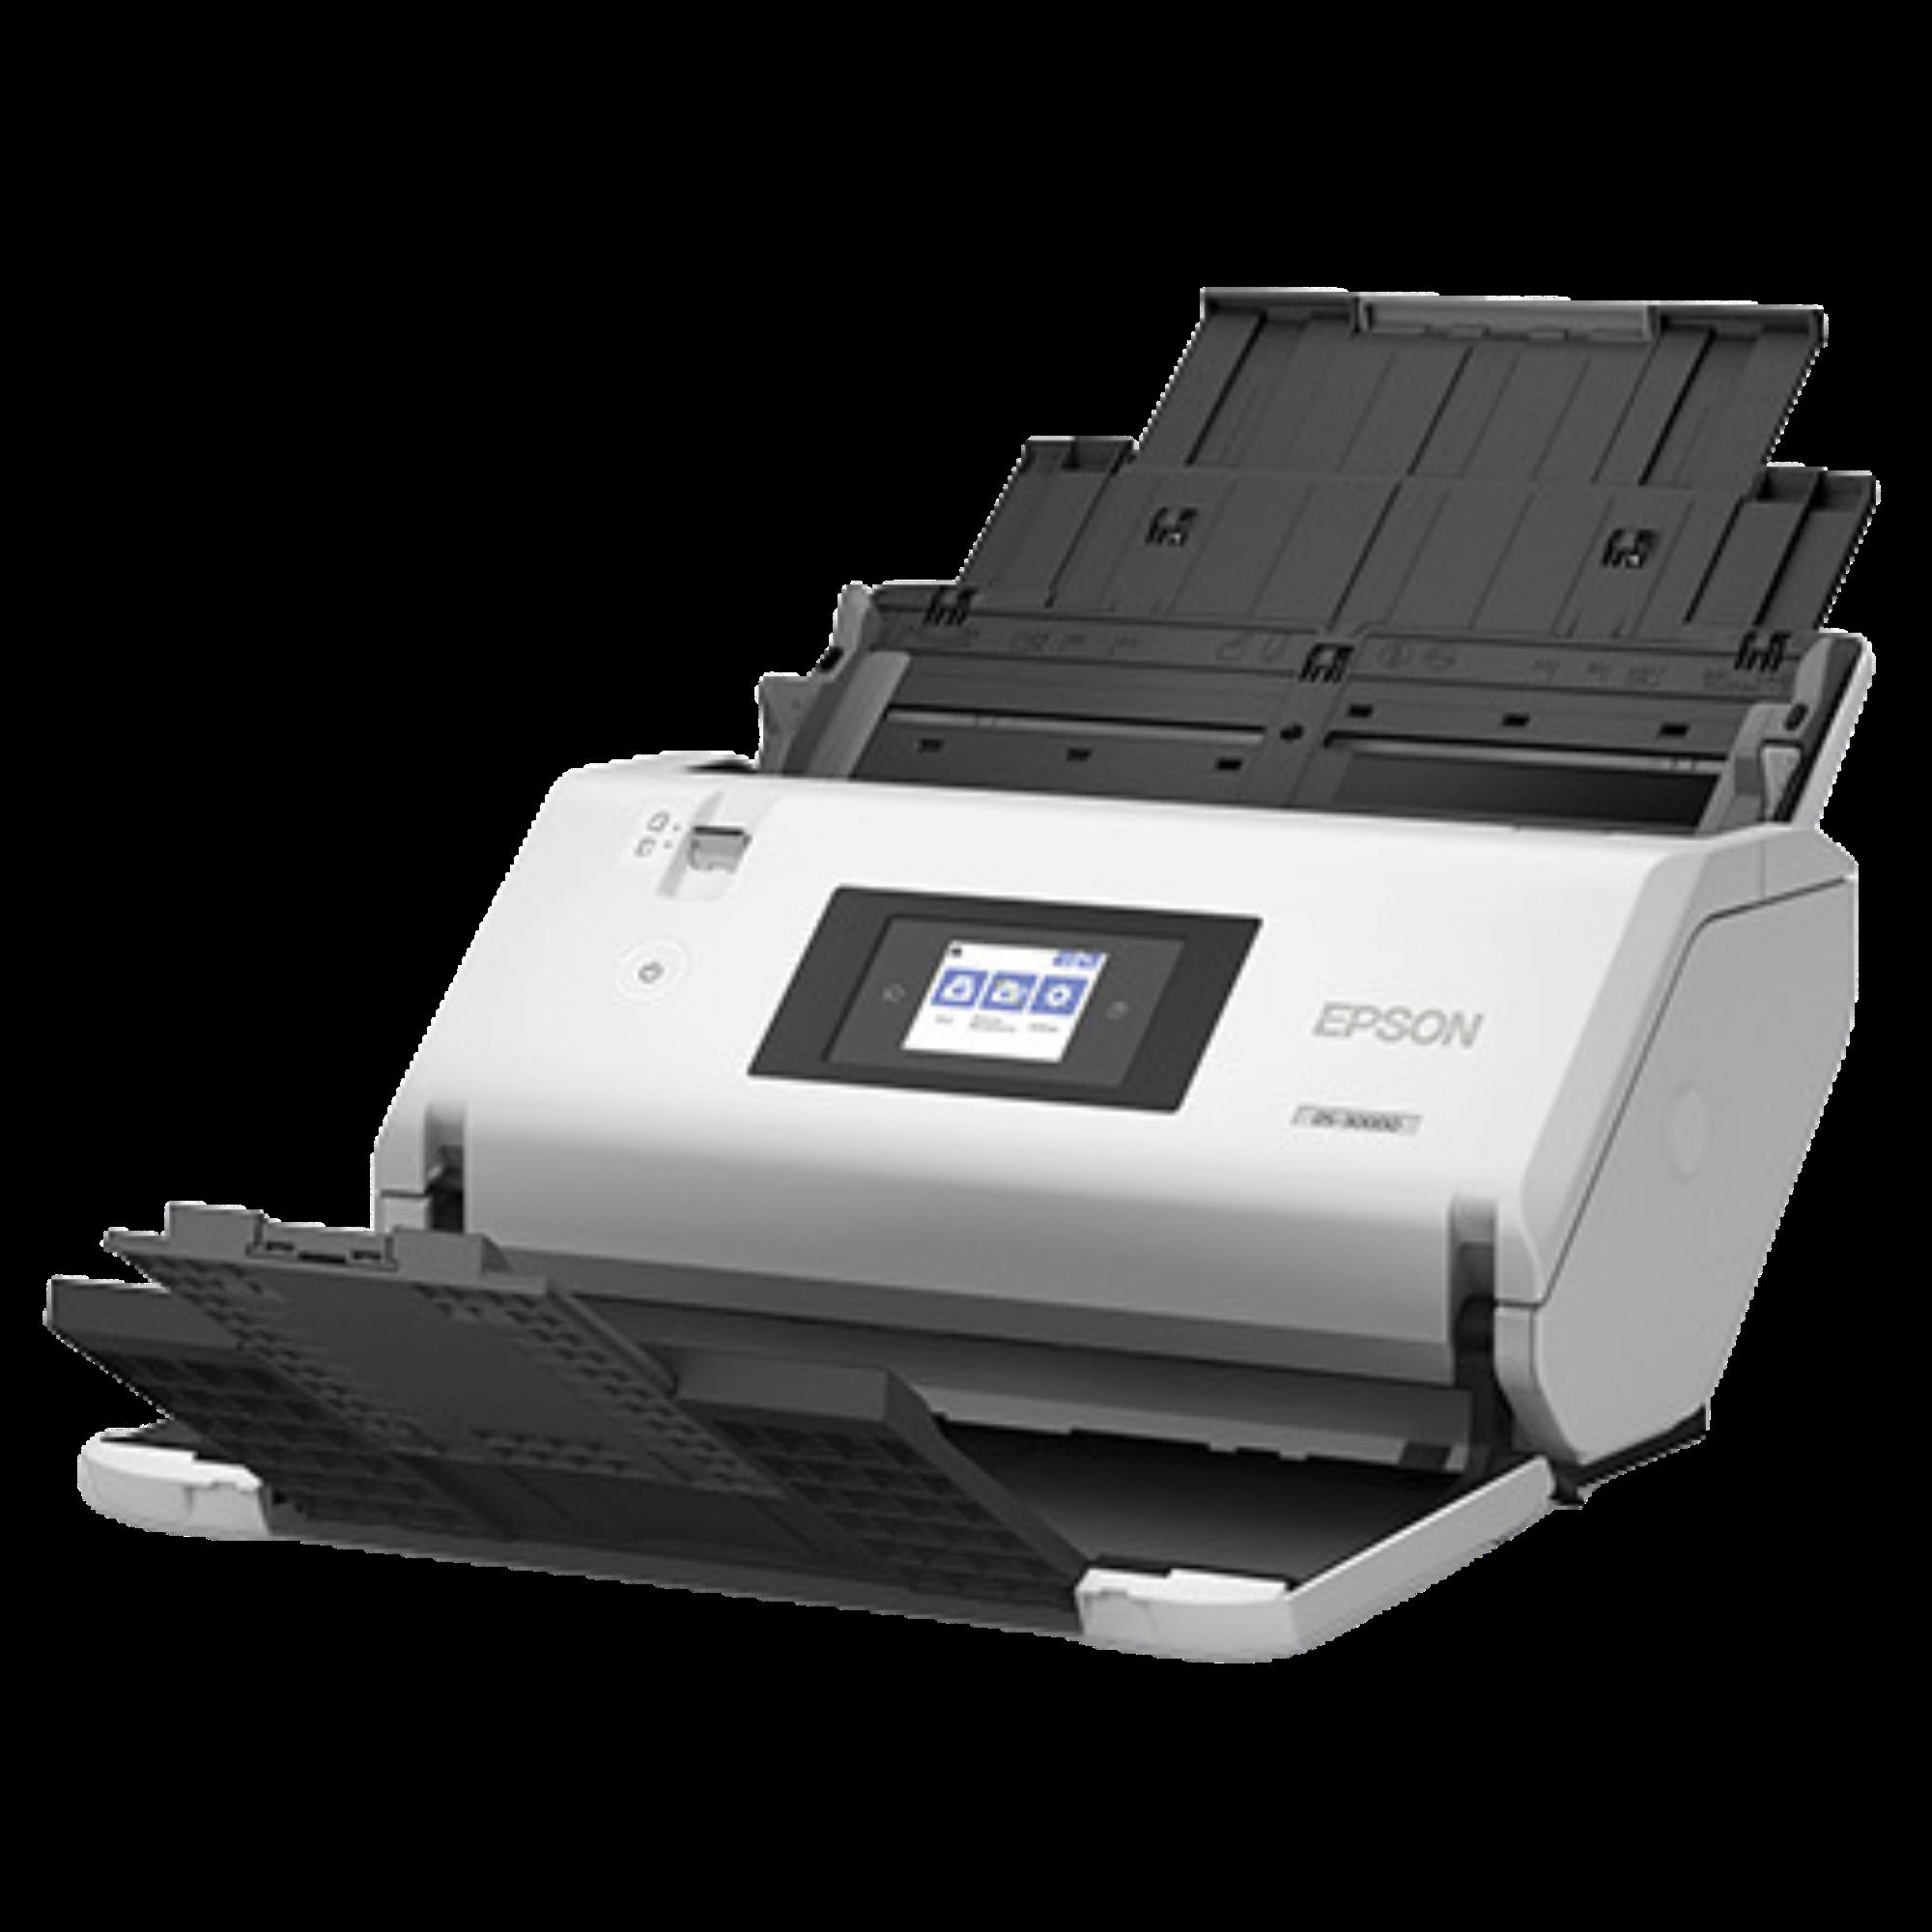 Epson DS-30000 70ppm 12x220